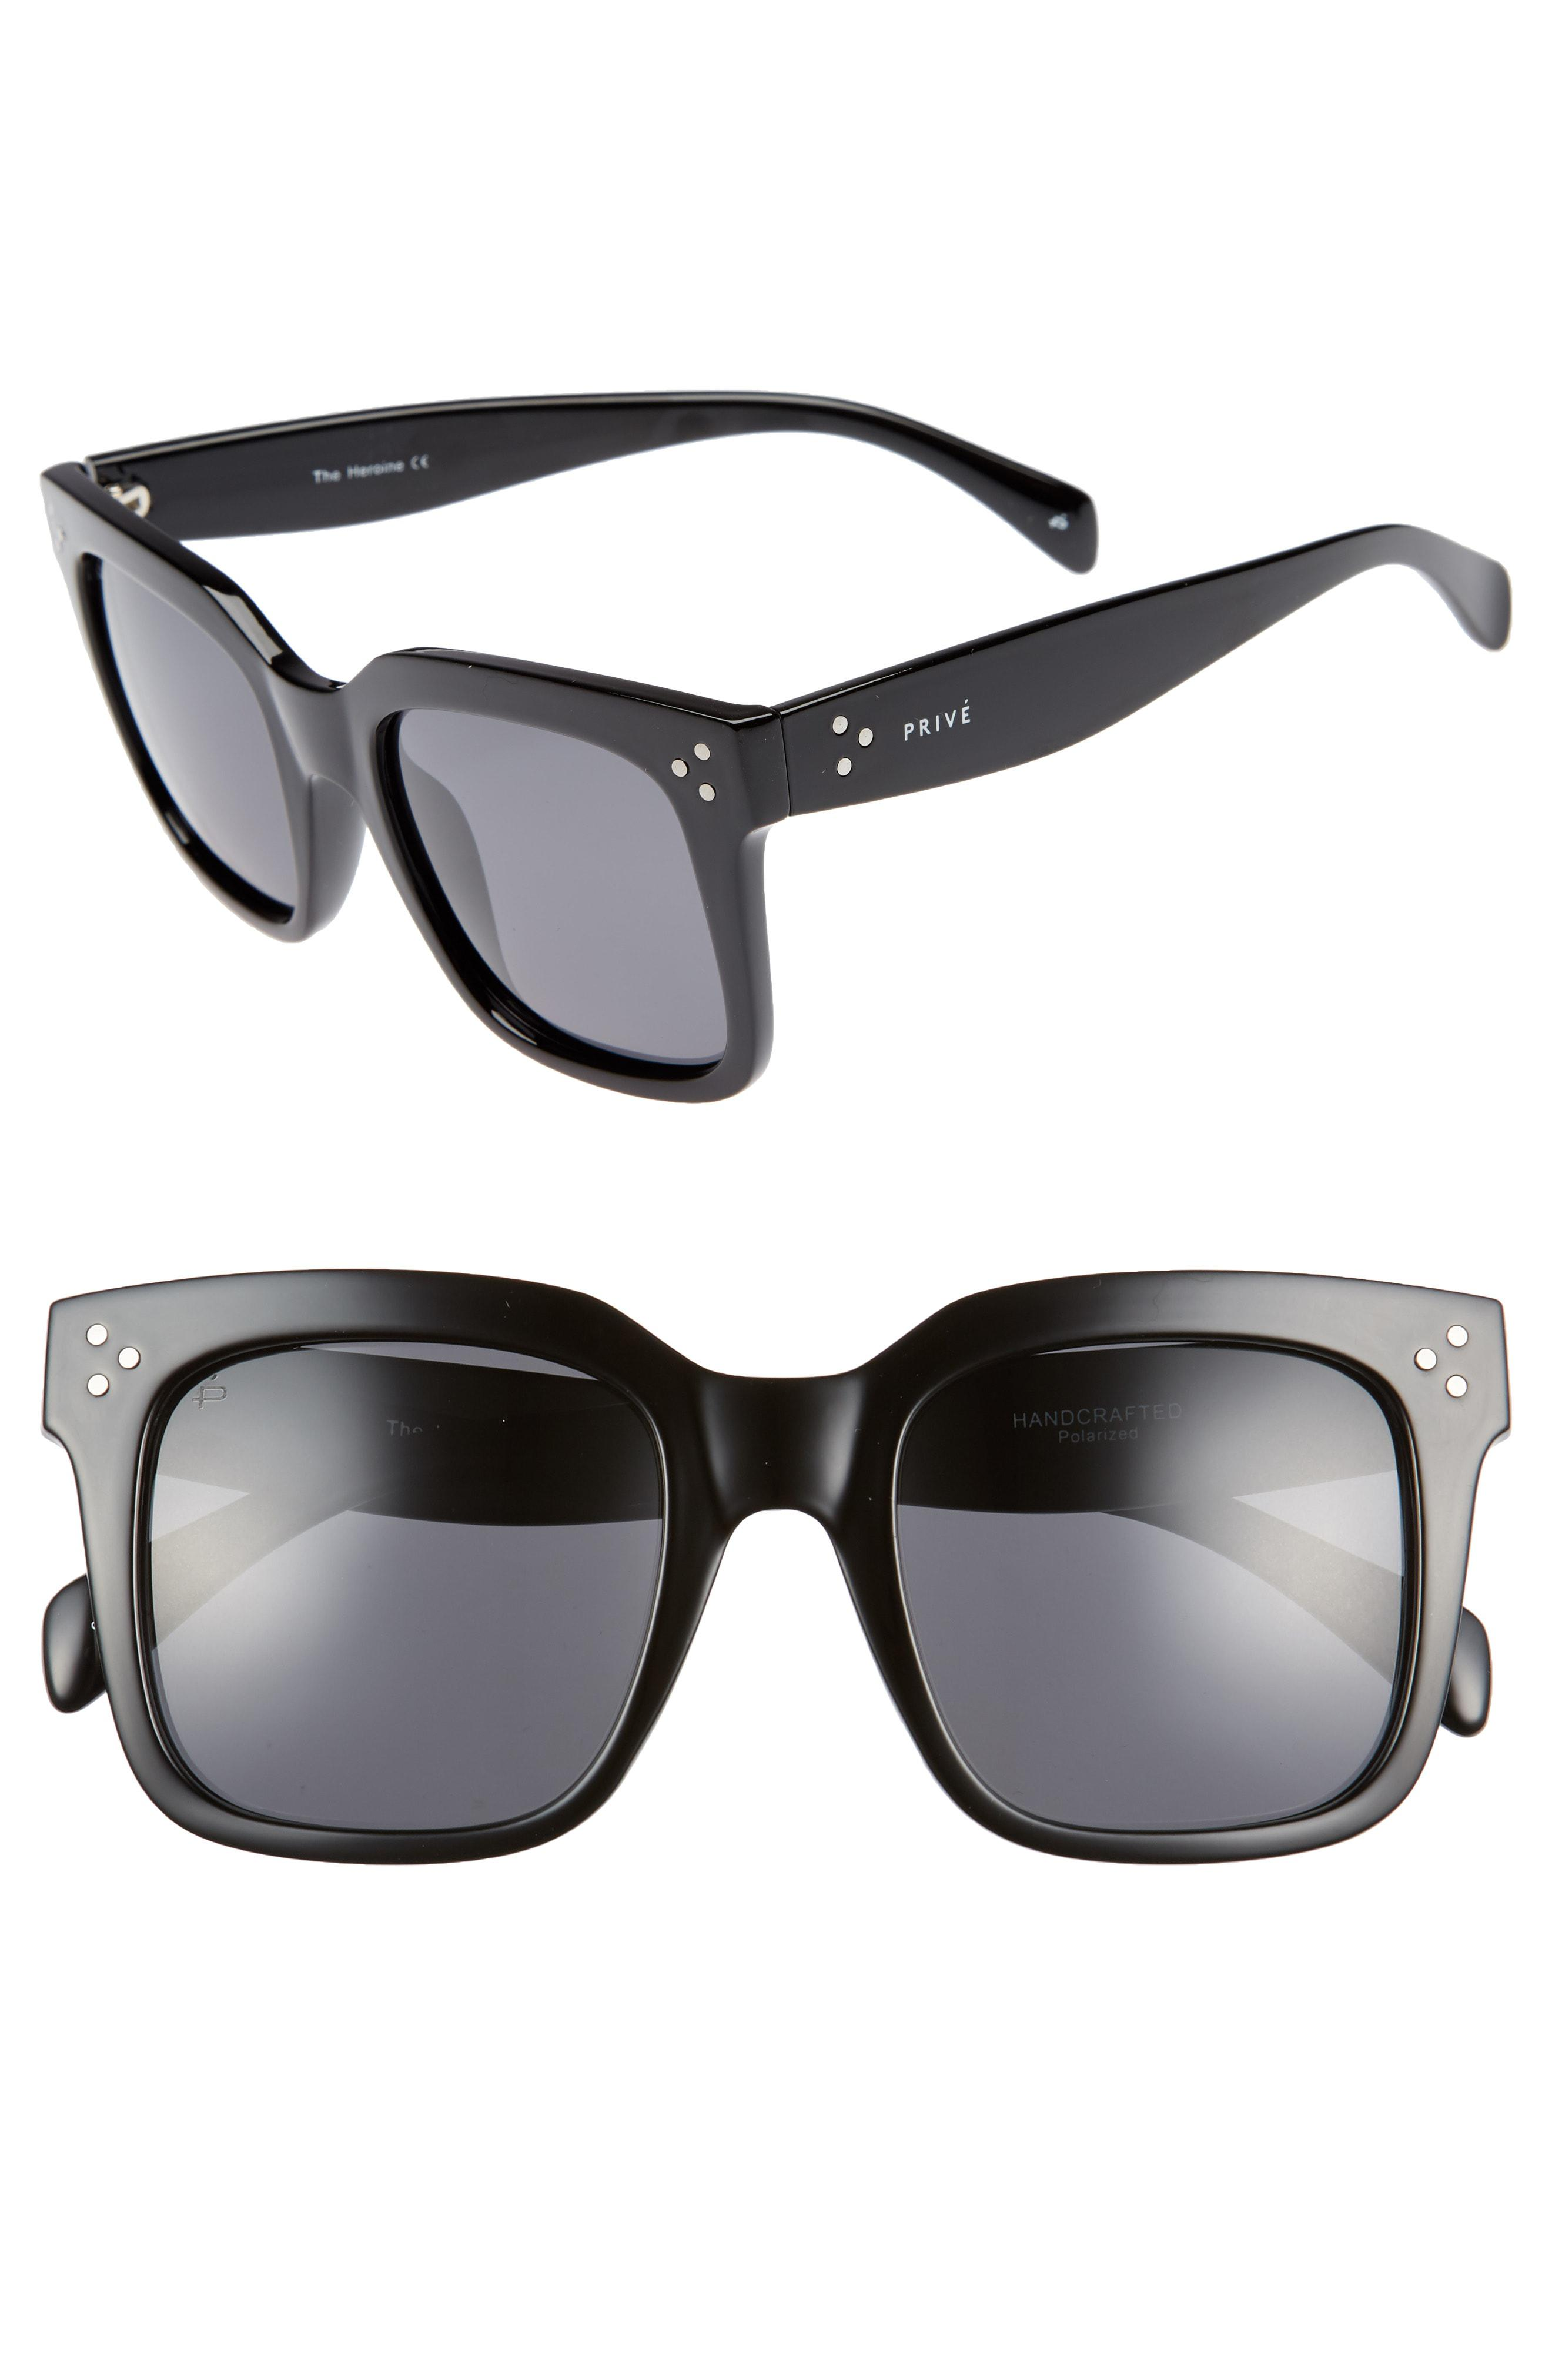 0cf63110bfa Lyst - Privé Revaux The Heroine 53mm Sunglasses in Black